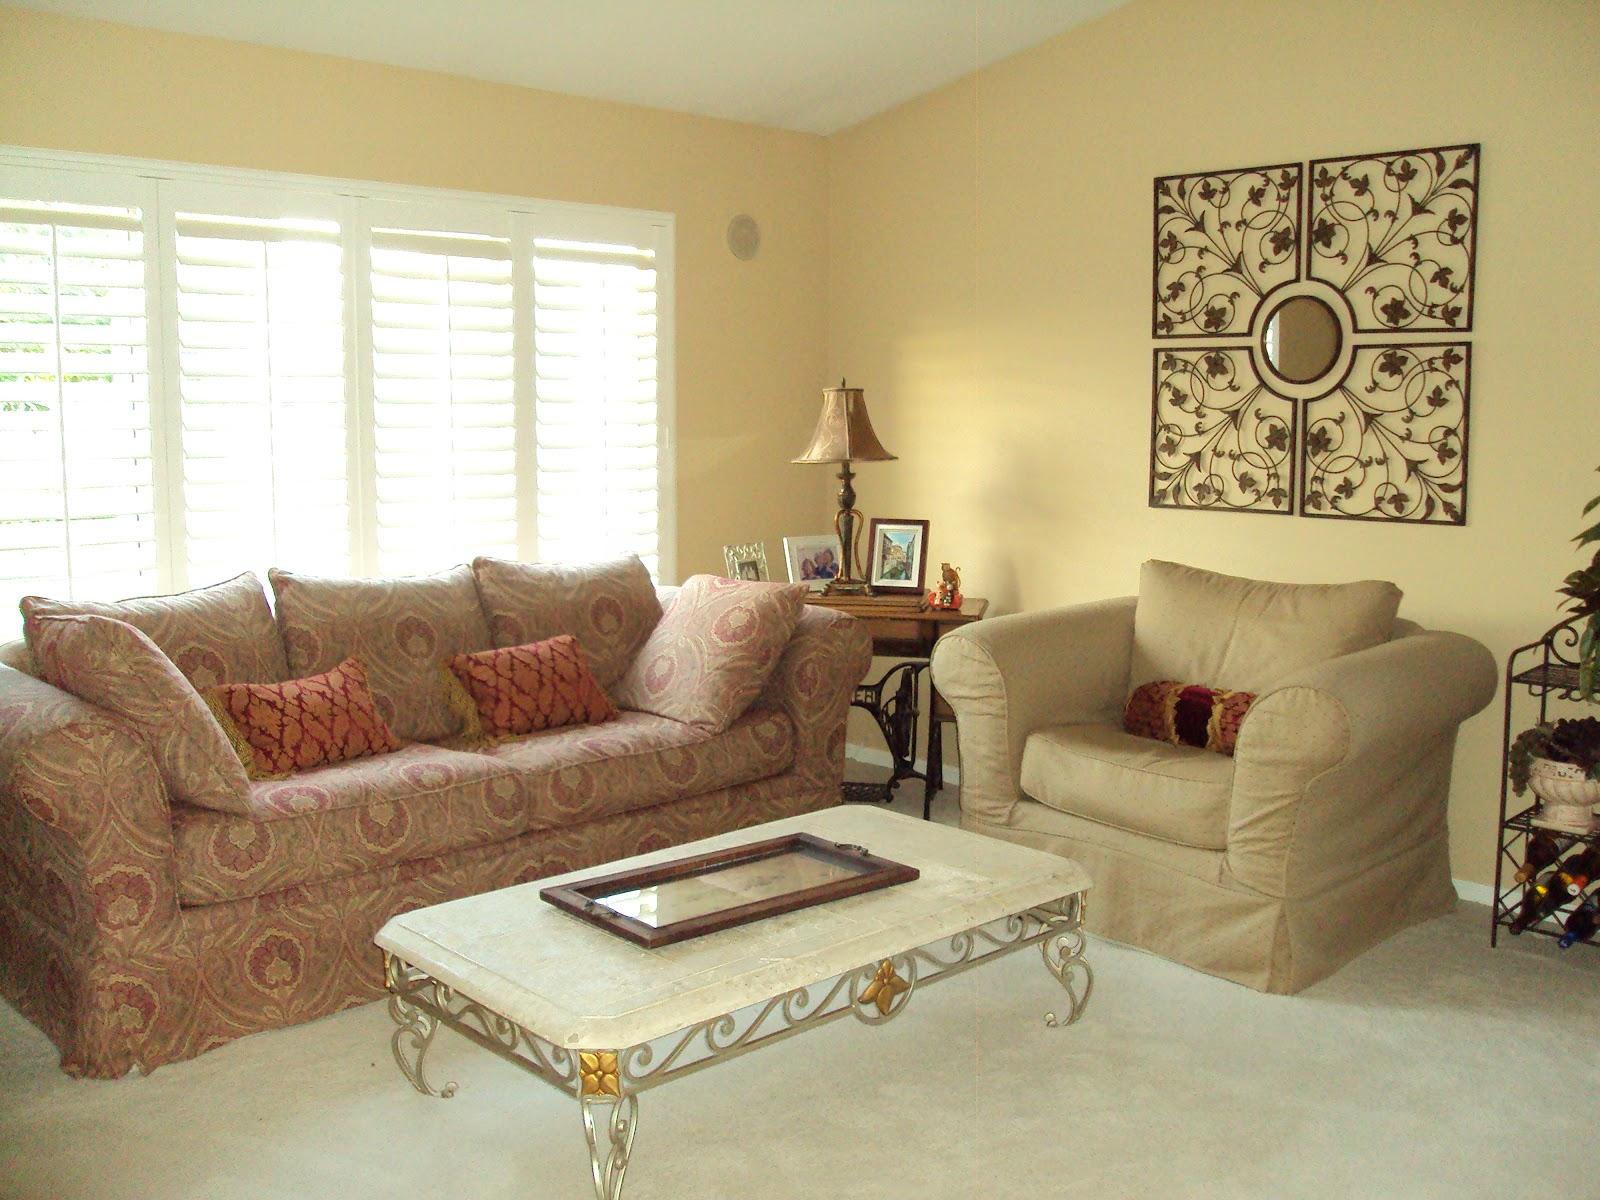 Friendship life and style travertine vs ceramic tile - Living room vs family room ...